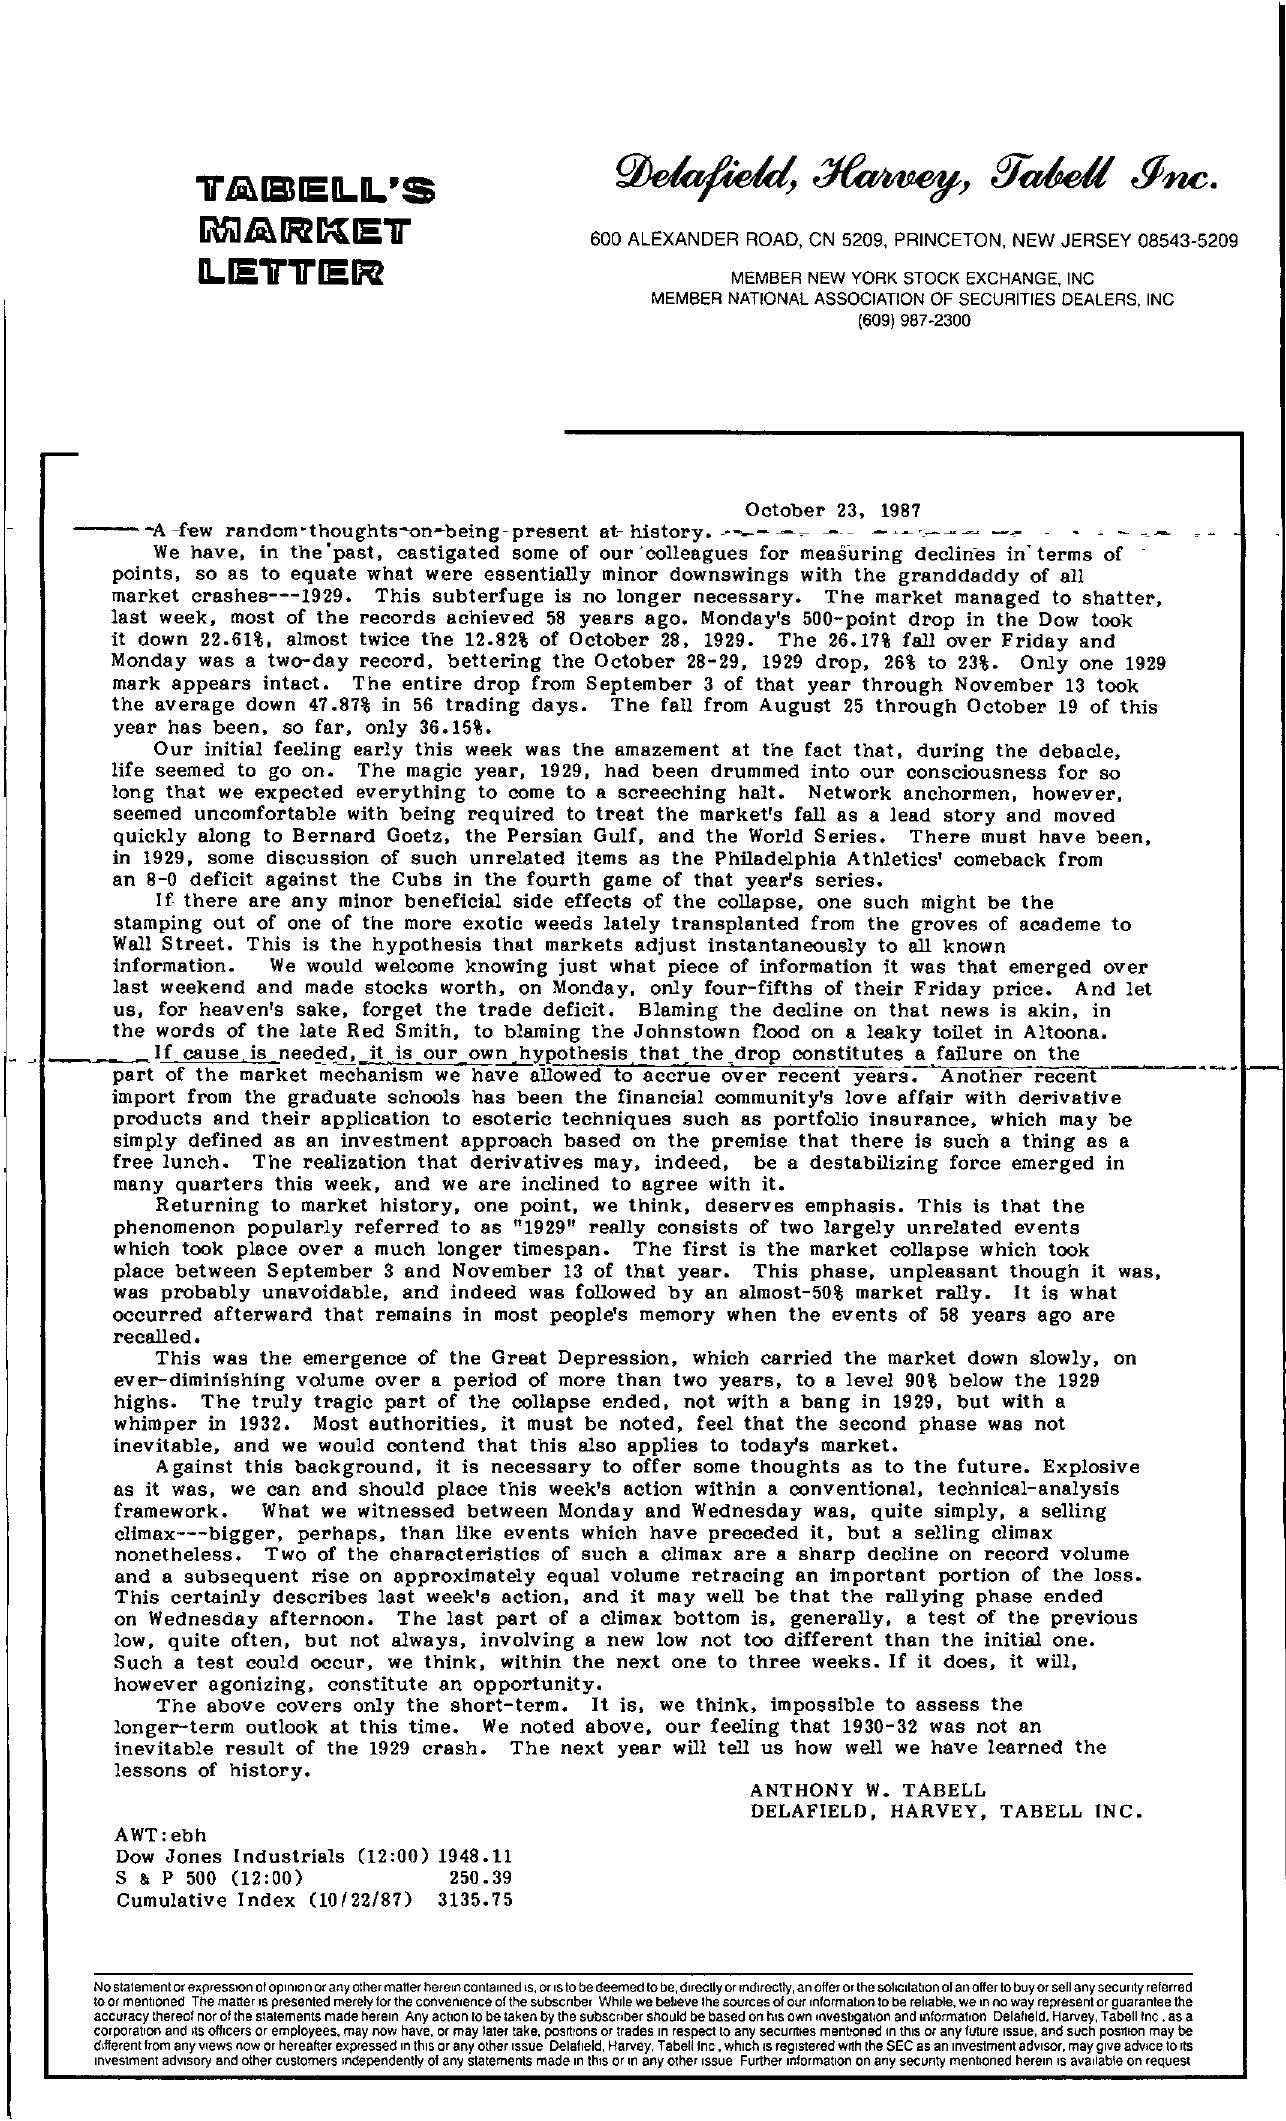 Tabell's Market Letter - October 23, 1987